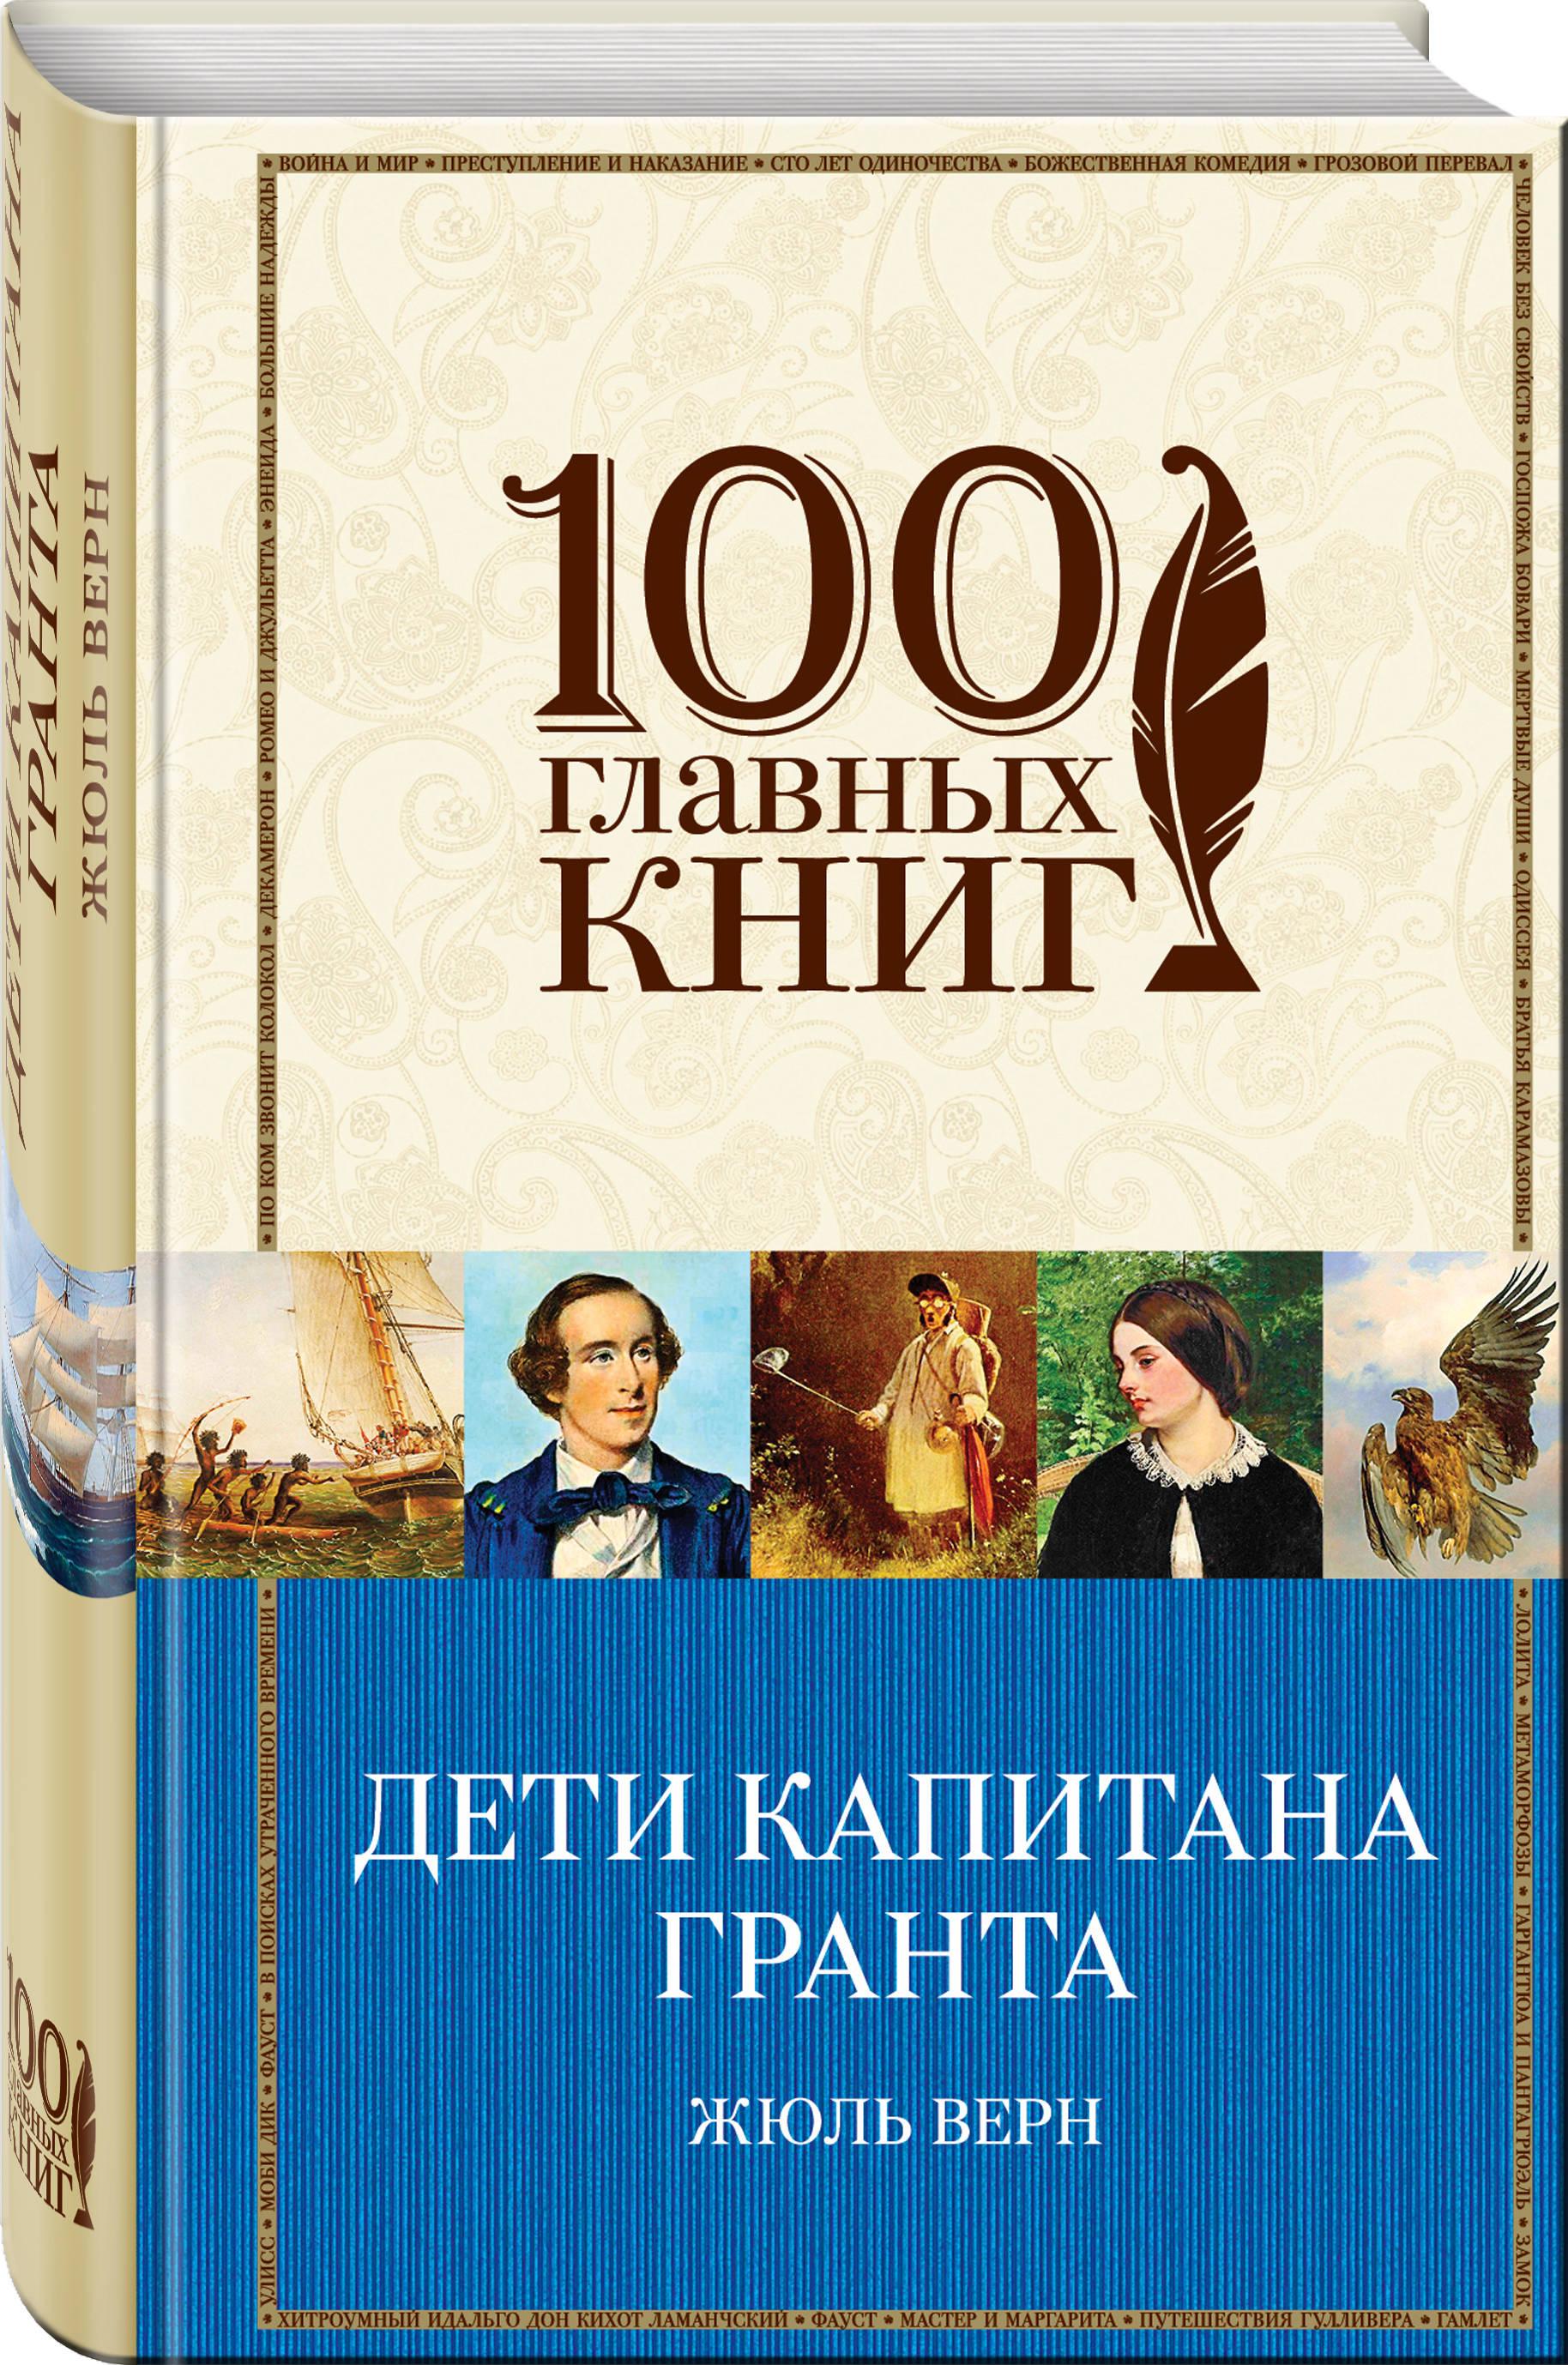 Верн Ж. Дети капитана Гранта ISBN: 978-5-699-97916-5 спойлер капота 2190 гранта